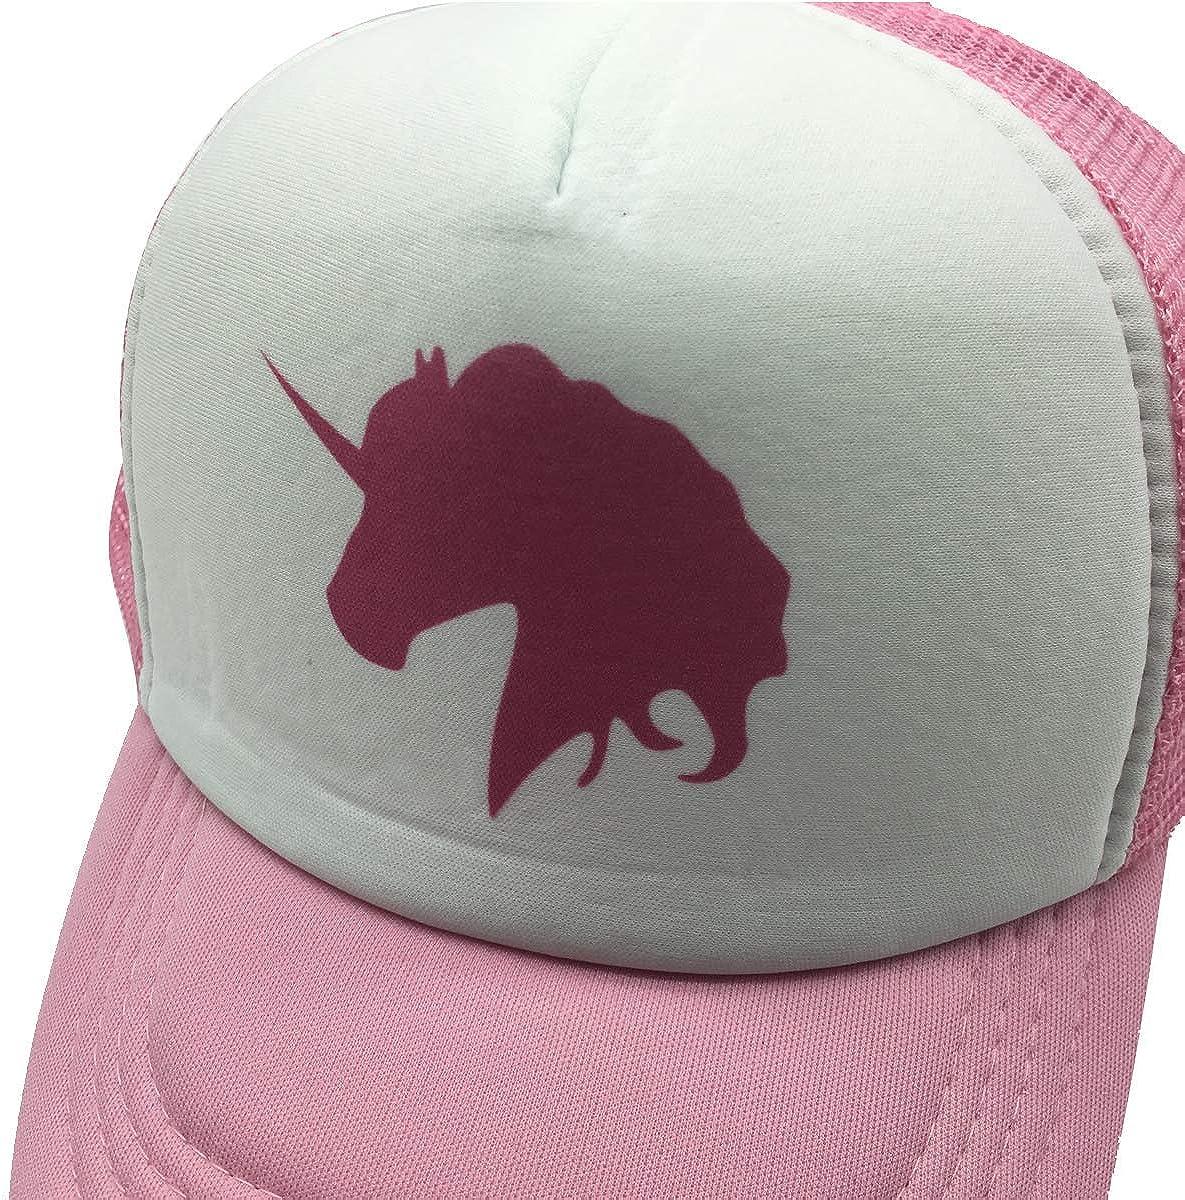 NVJUI JUFOPL Boys Baseball Cap Mesh Back Snapback Funny Trucker Hat for Kid